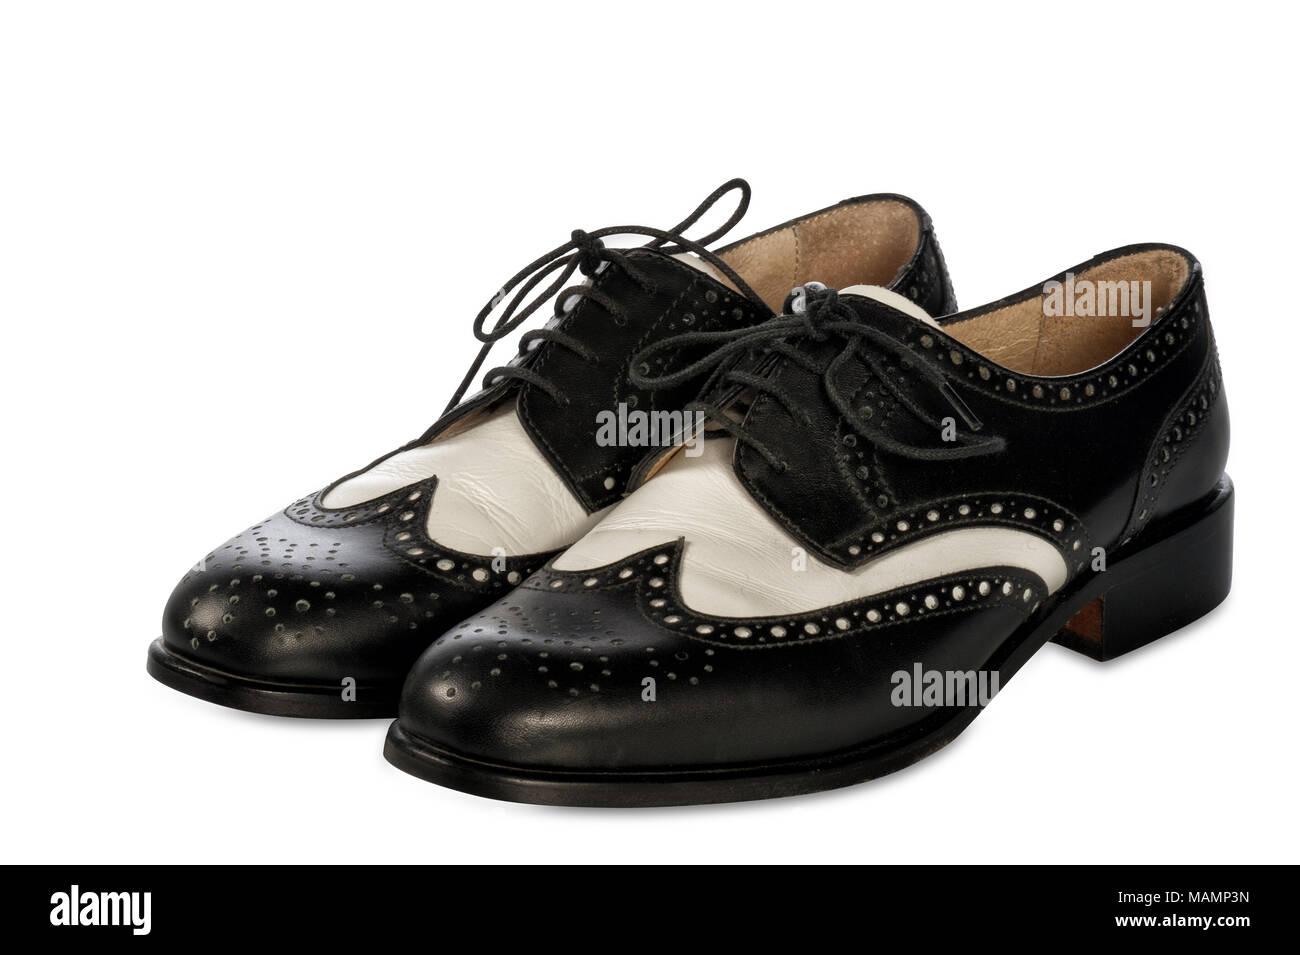 elegant two-tone shoes - Stock Image